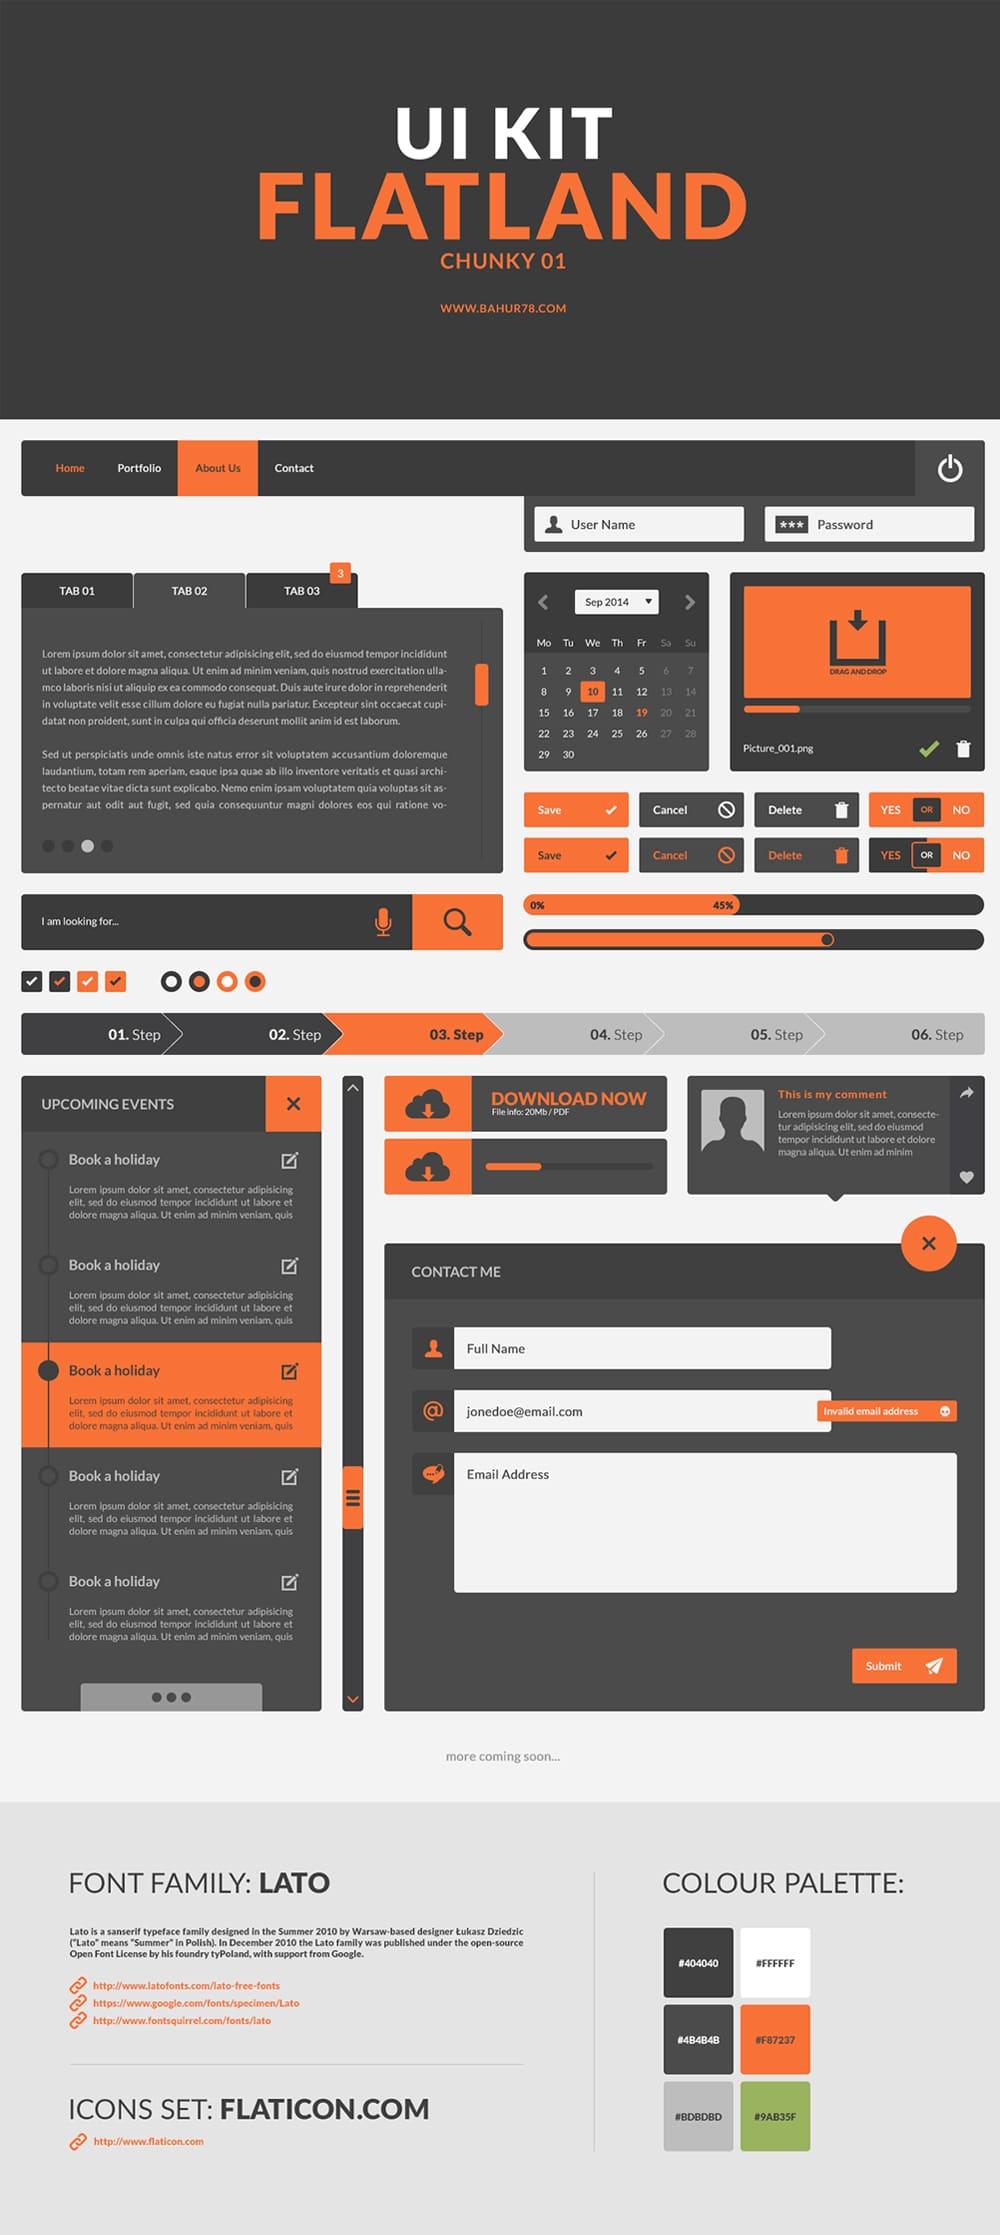 Flatland - Free UI Kit PSD